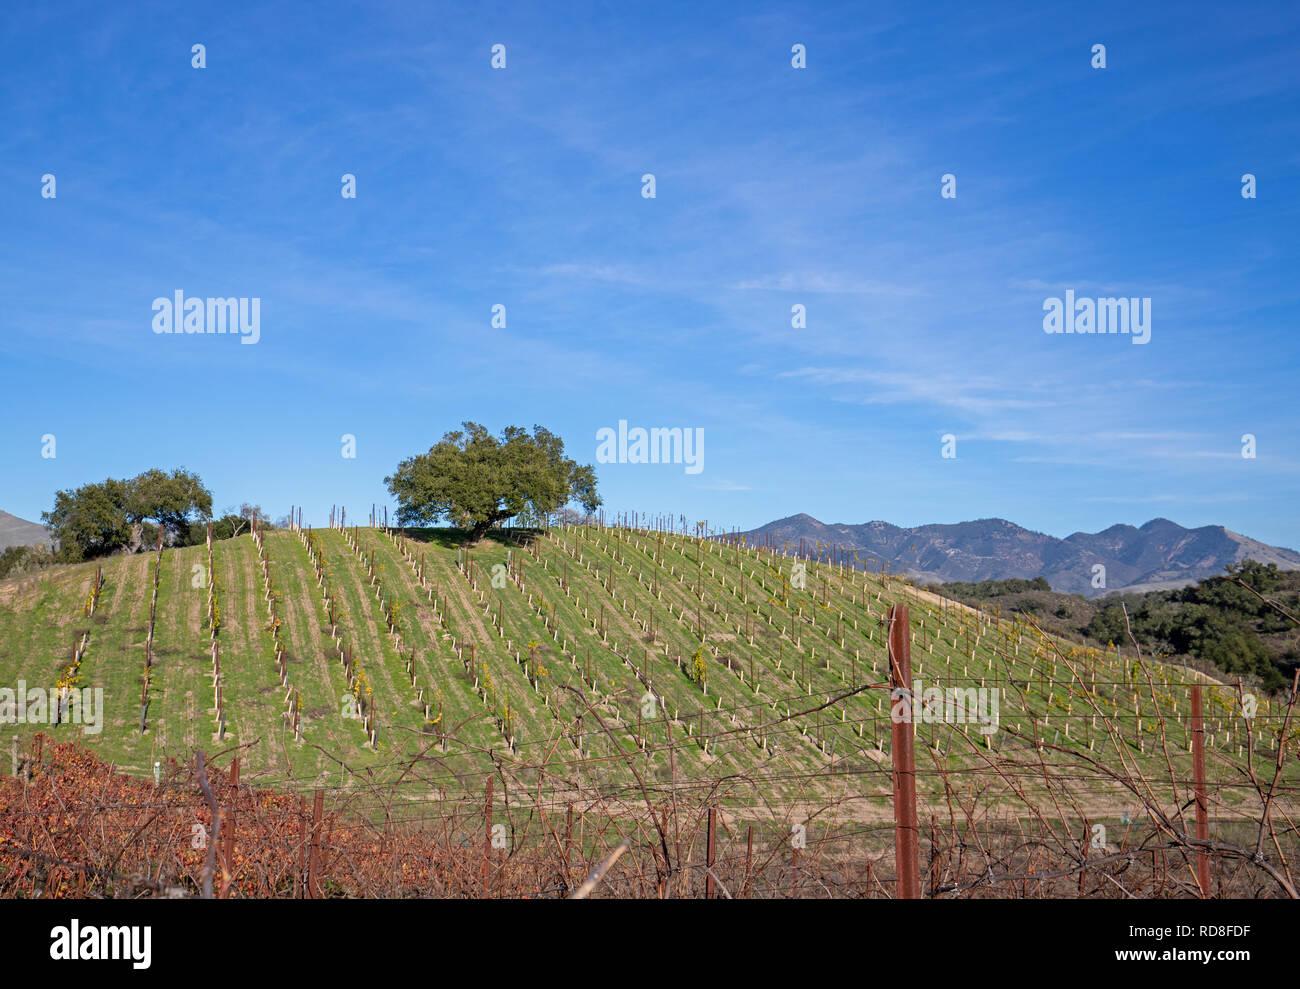 Lone oak tree on hillside in vineyard in Central California United States Stock Photo